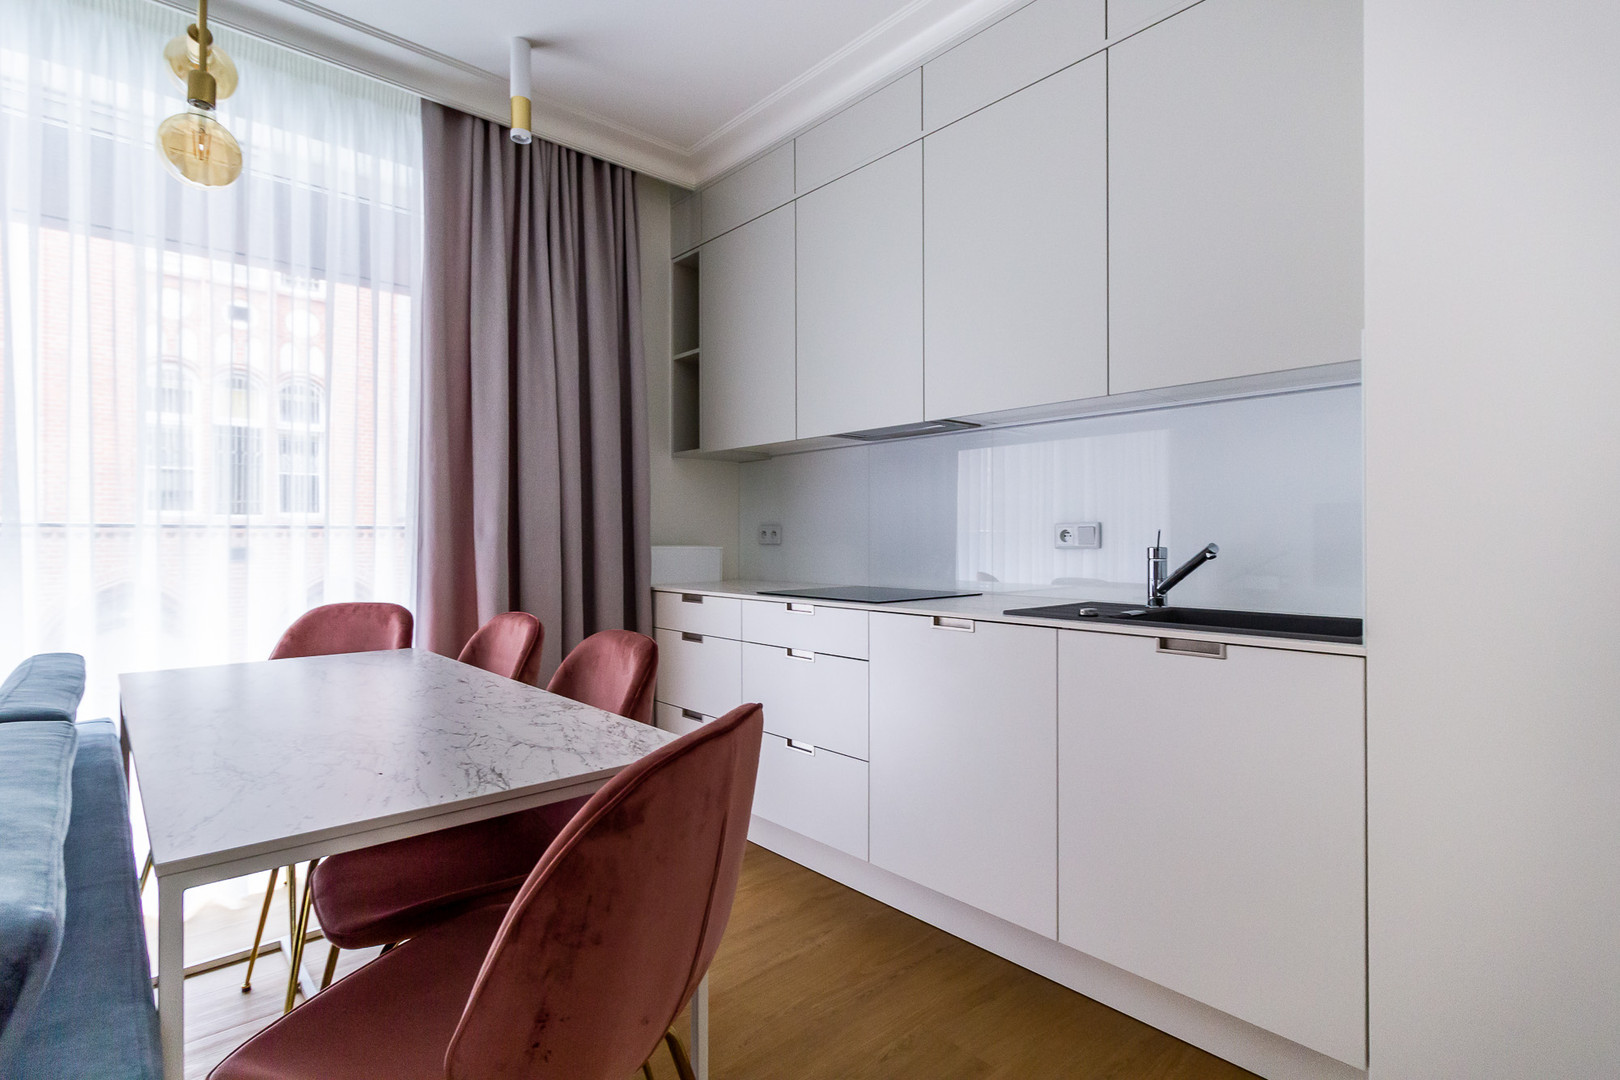 Property to rent Poznan Poland-8.jpg